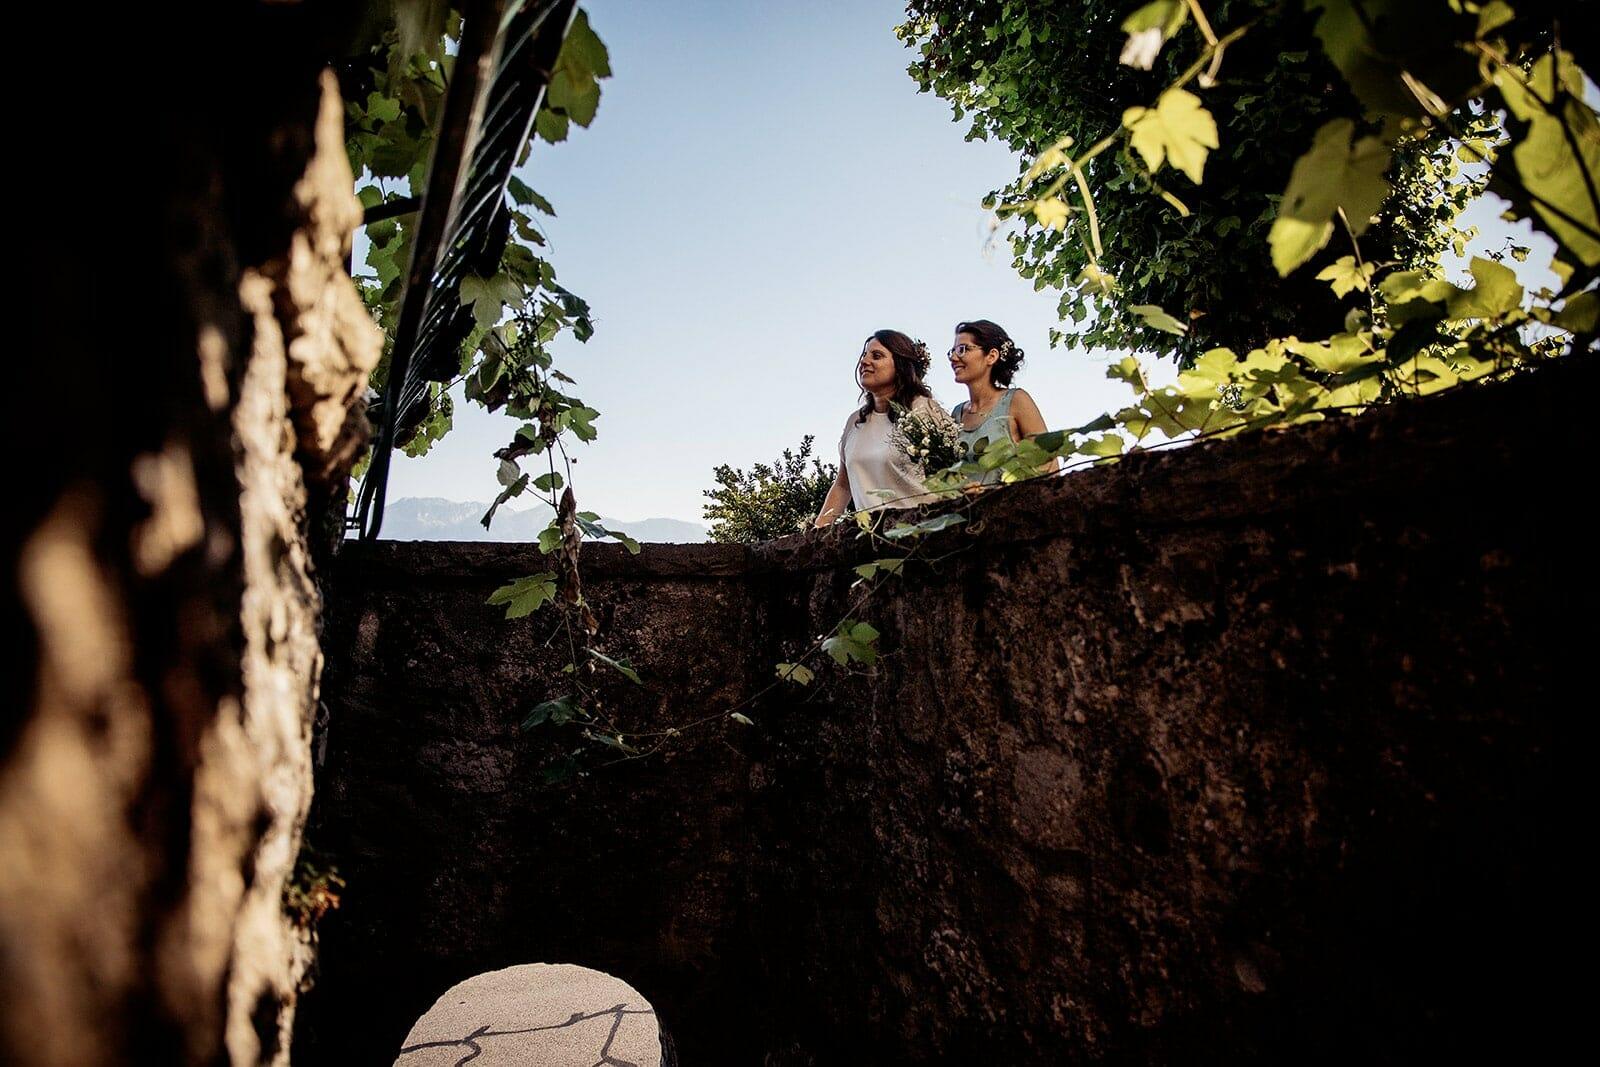 Best reviews Wedding photographer Lausanne Suisse castile ALMA photographer wedding at Domaine du Burignon St Saphorin Switzerland